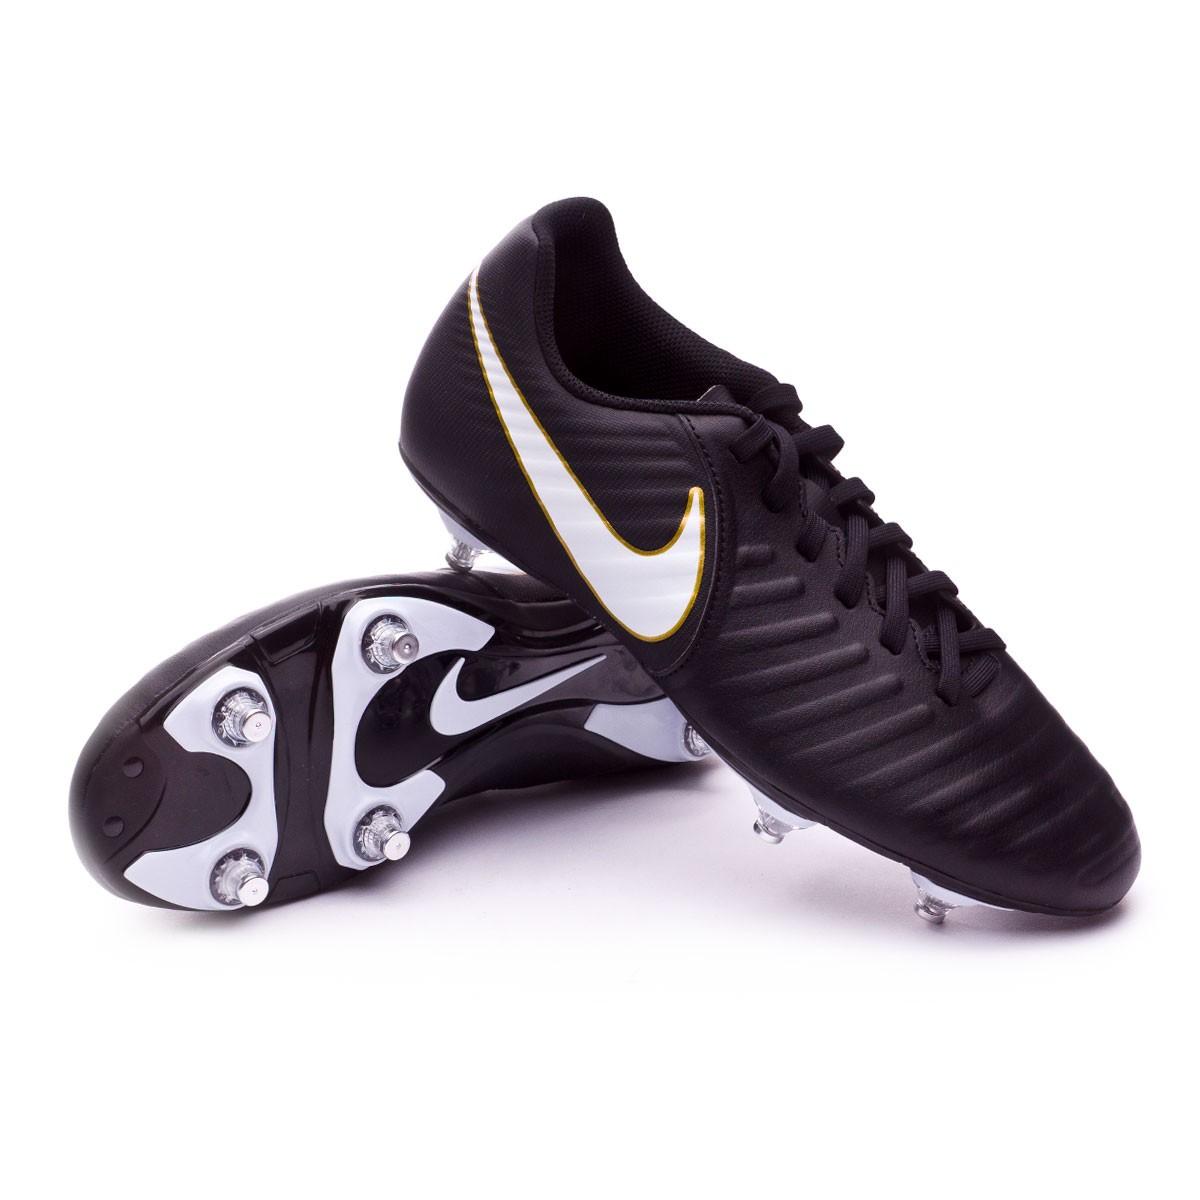 19ff24fda0b9 Football Boots Nike Tiempo Rio IV SG Black-White - Tienda de fútbol ...